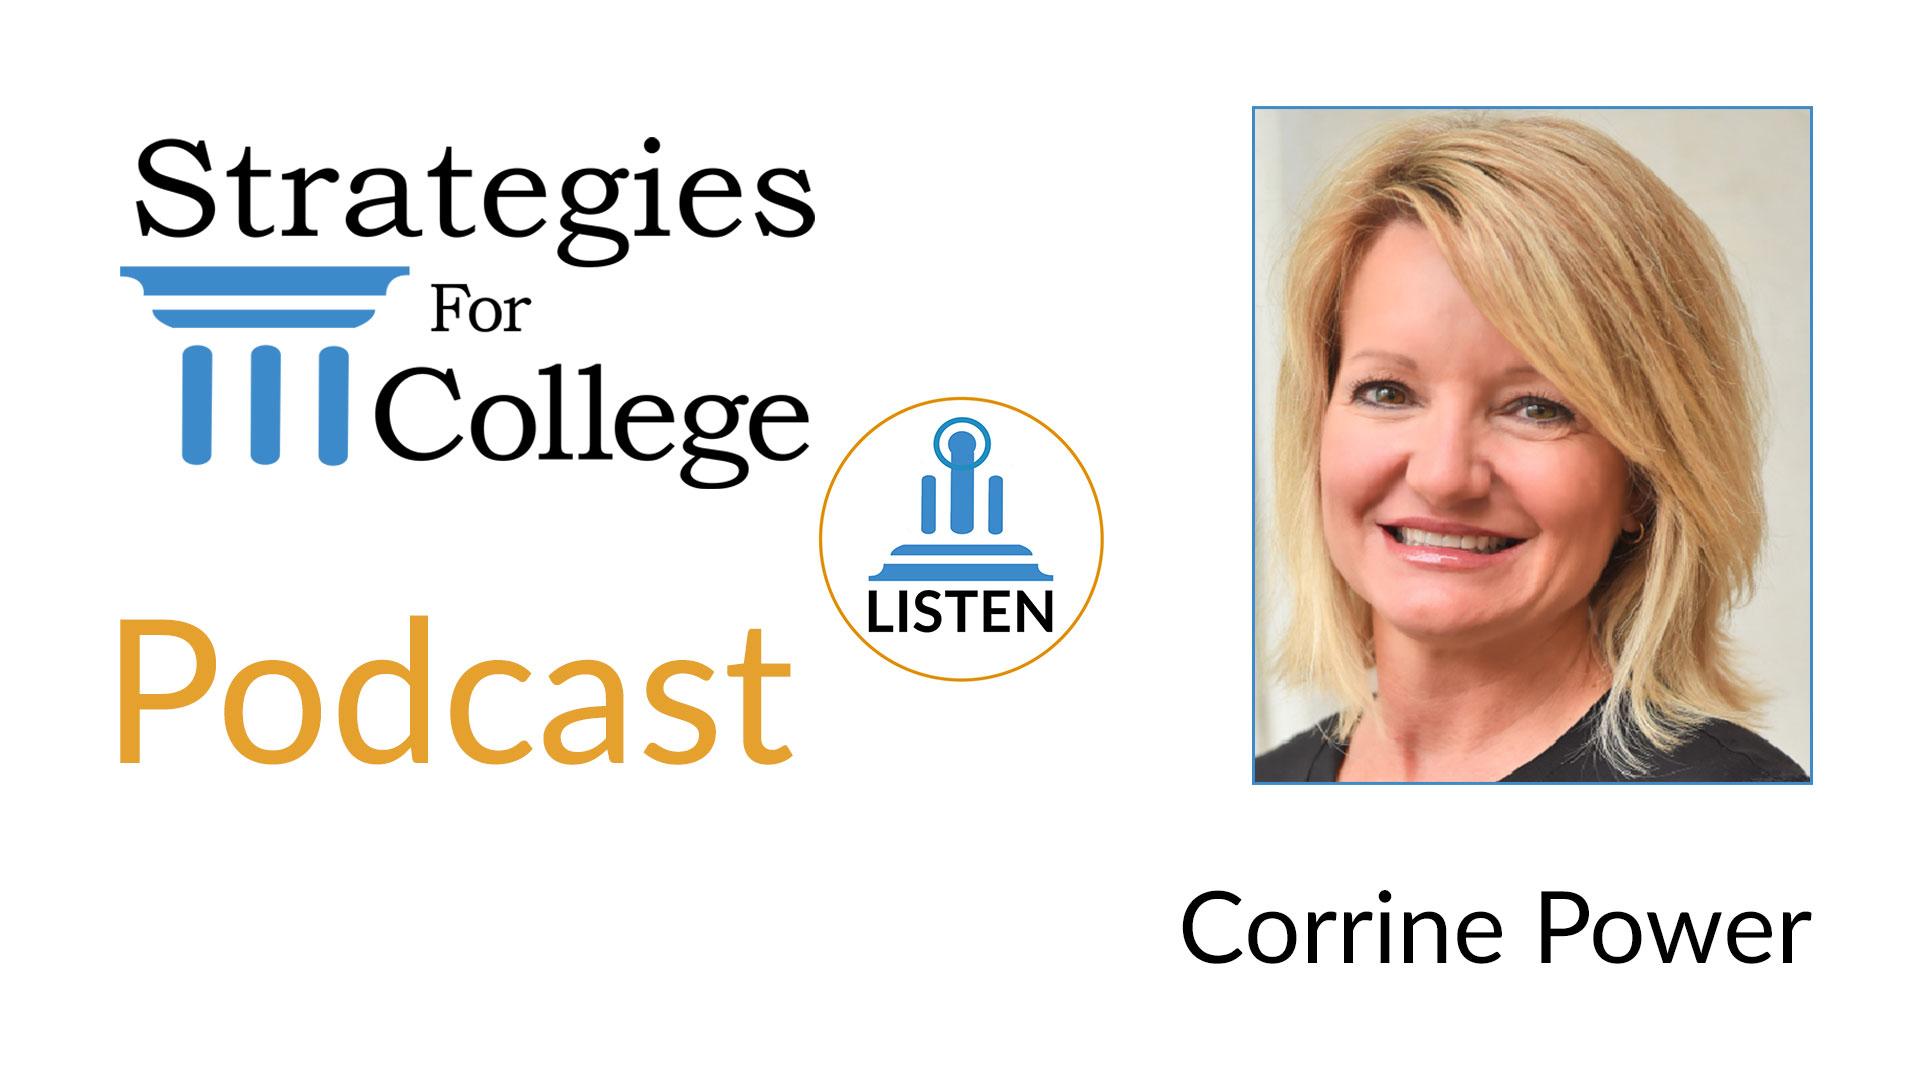 Podcast: Corinne Power